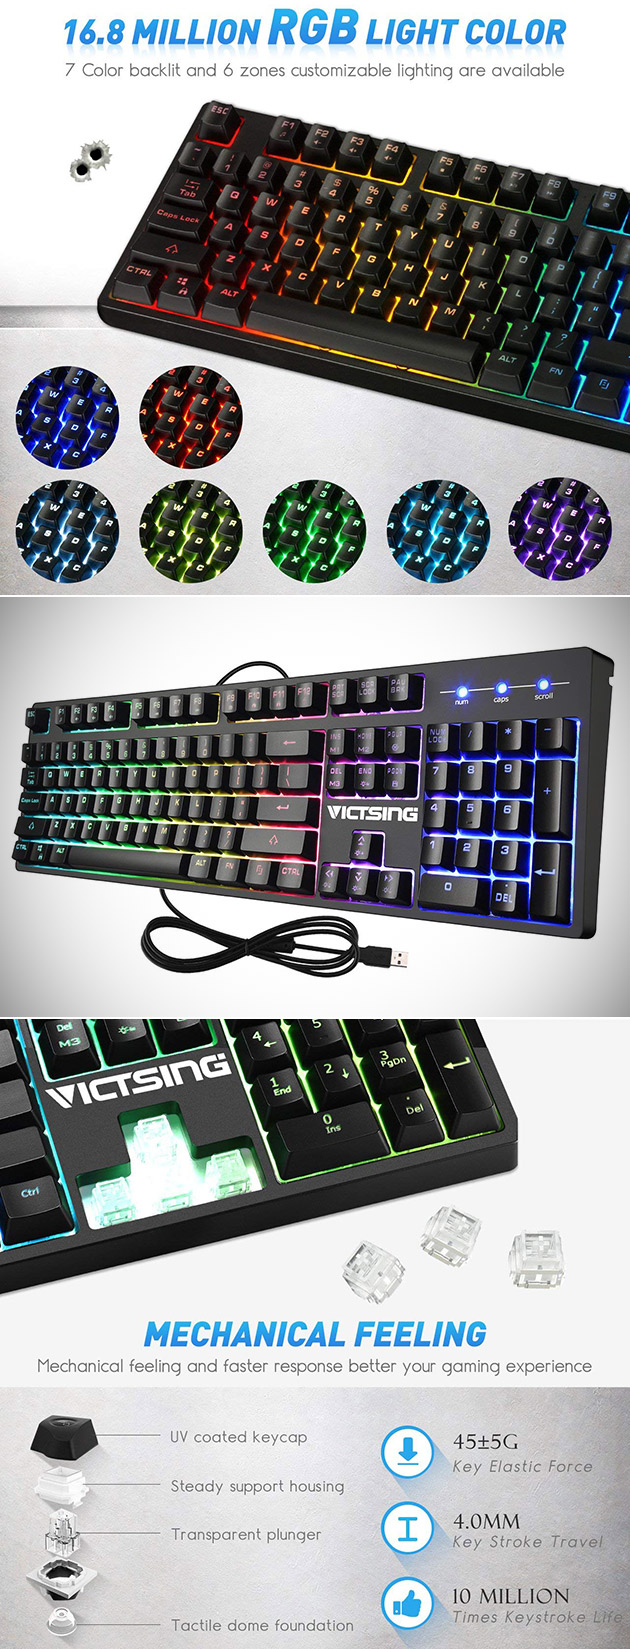 VicTsing RGB Keyboard